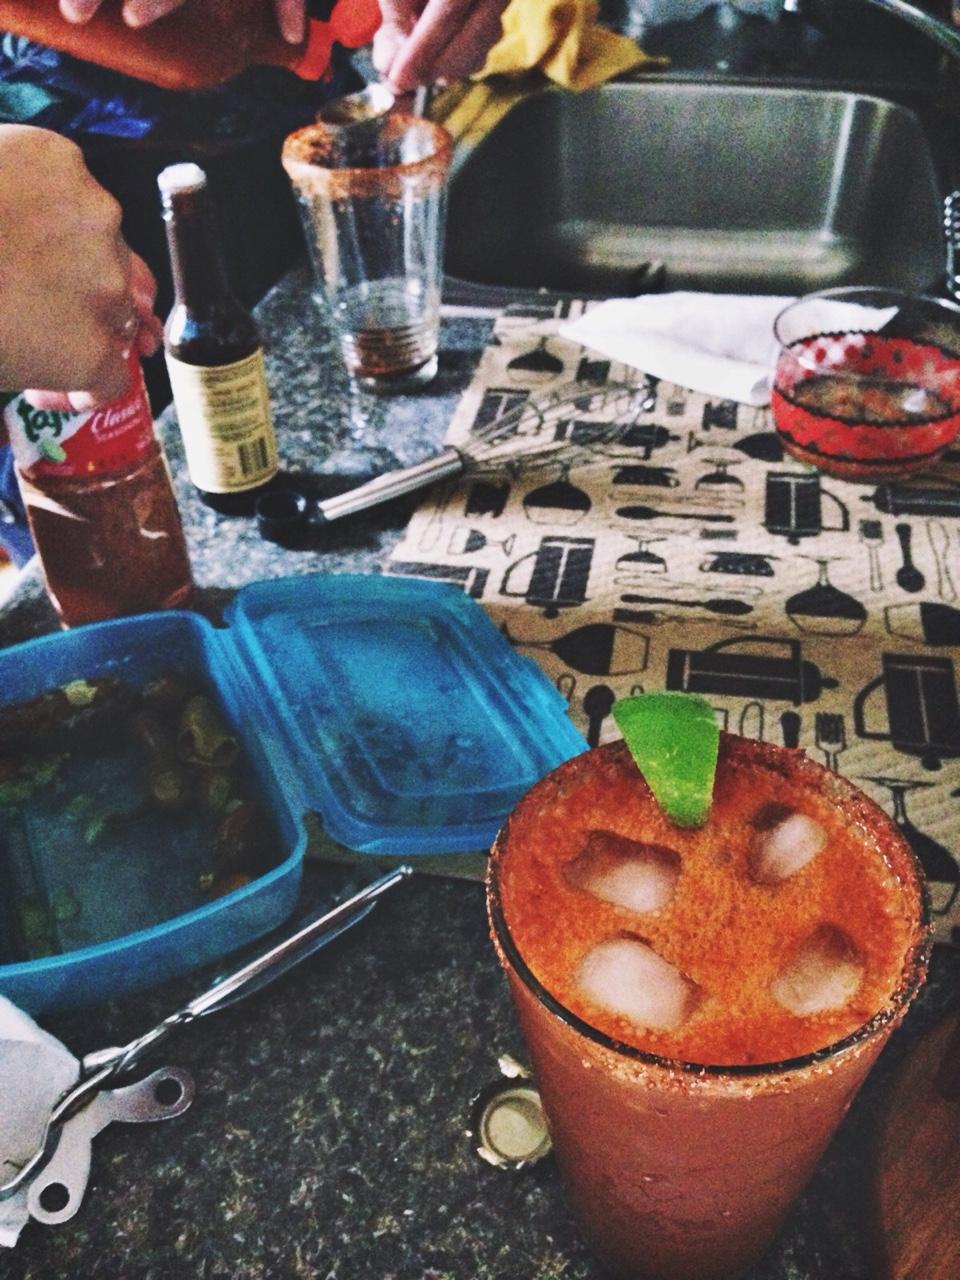 Sundays are for homemade micheladas. ¡Salud!